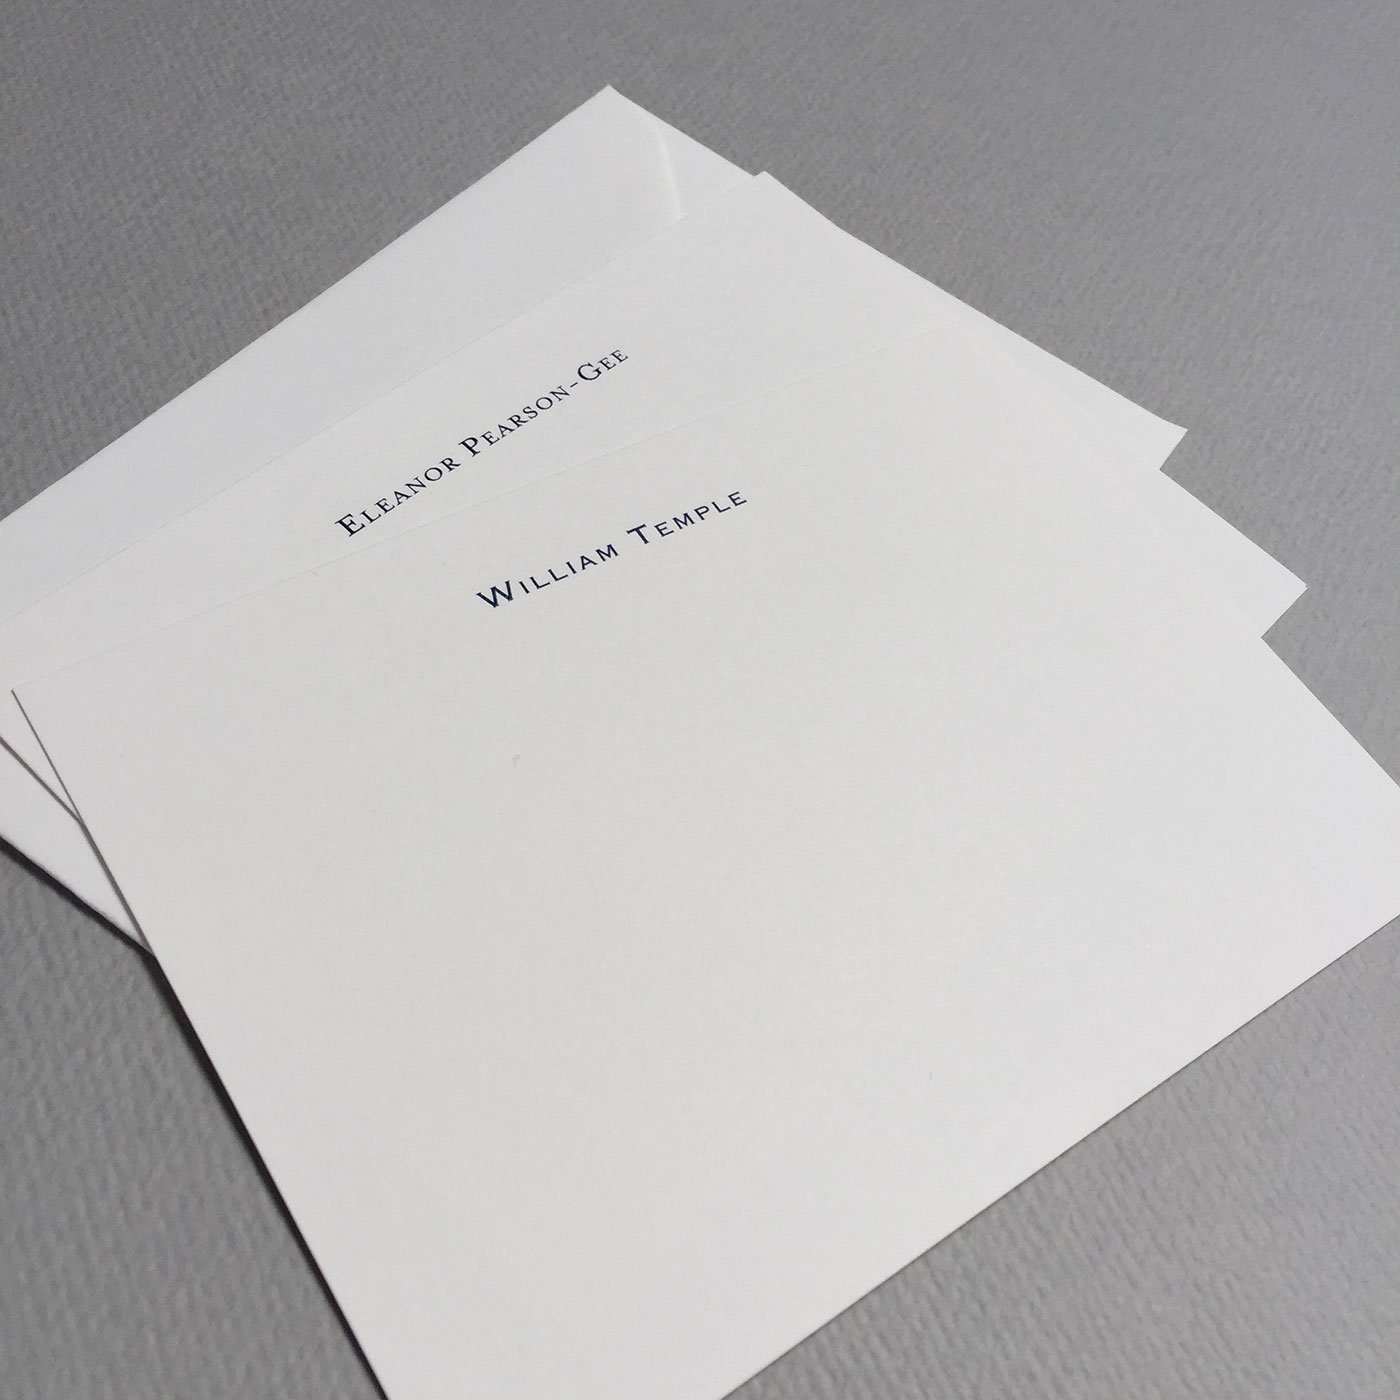 Millenials' Correspondence Cards